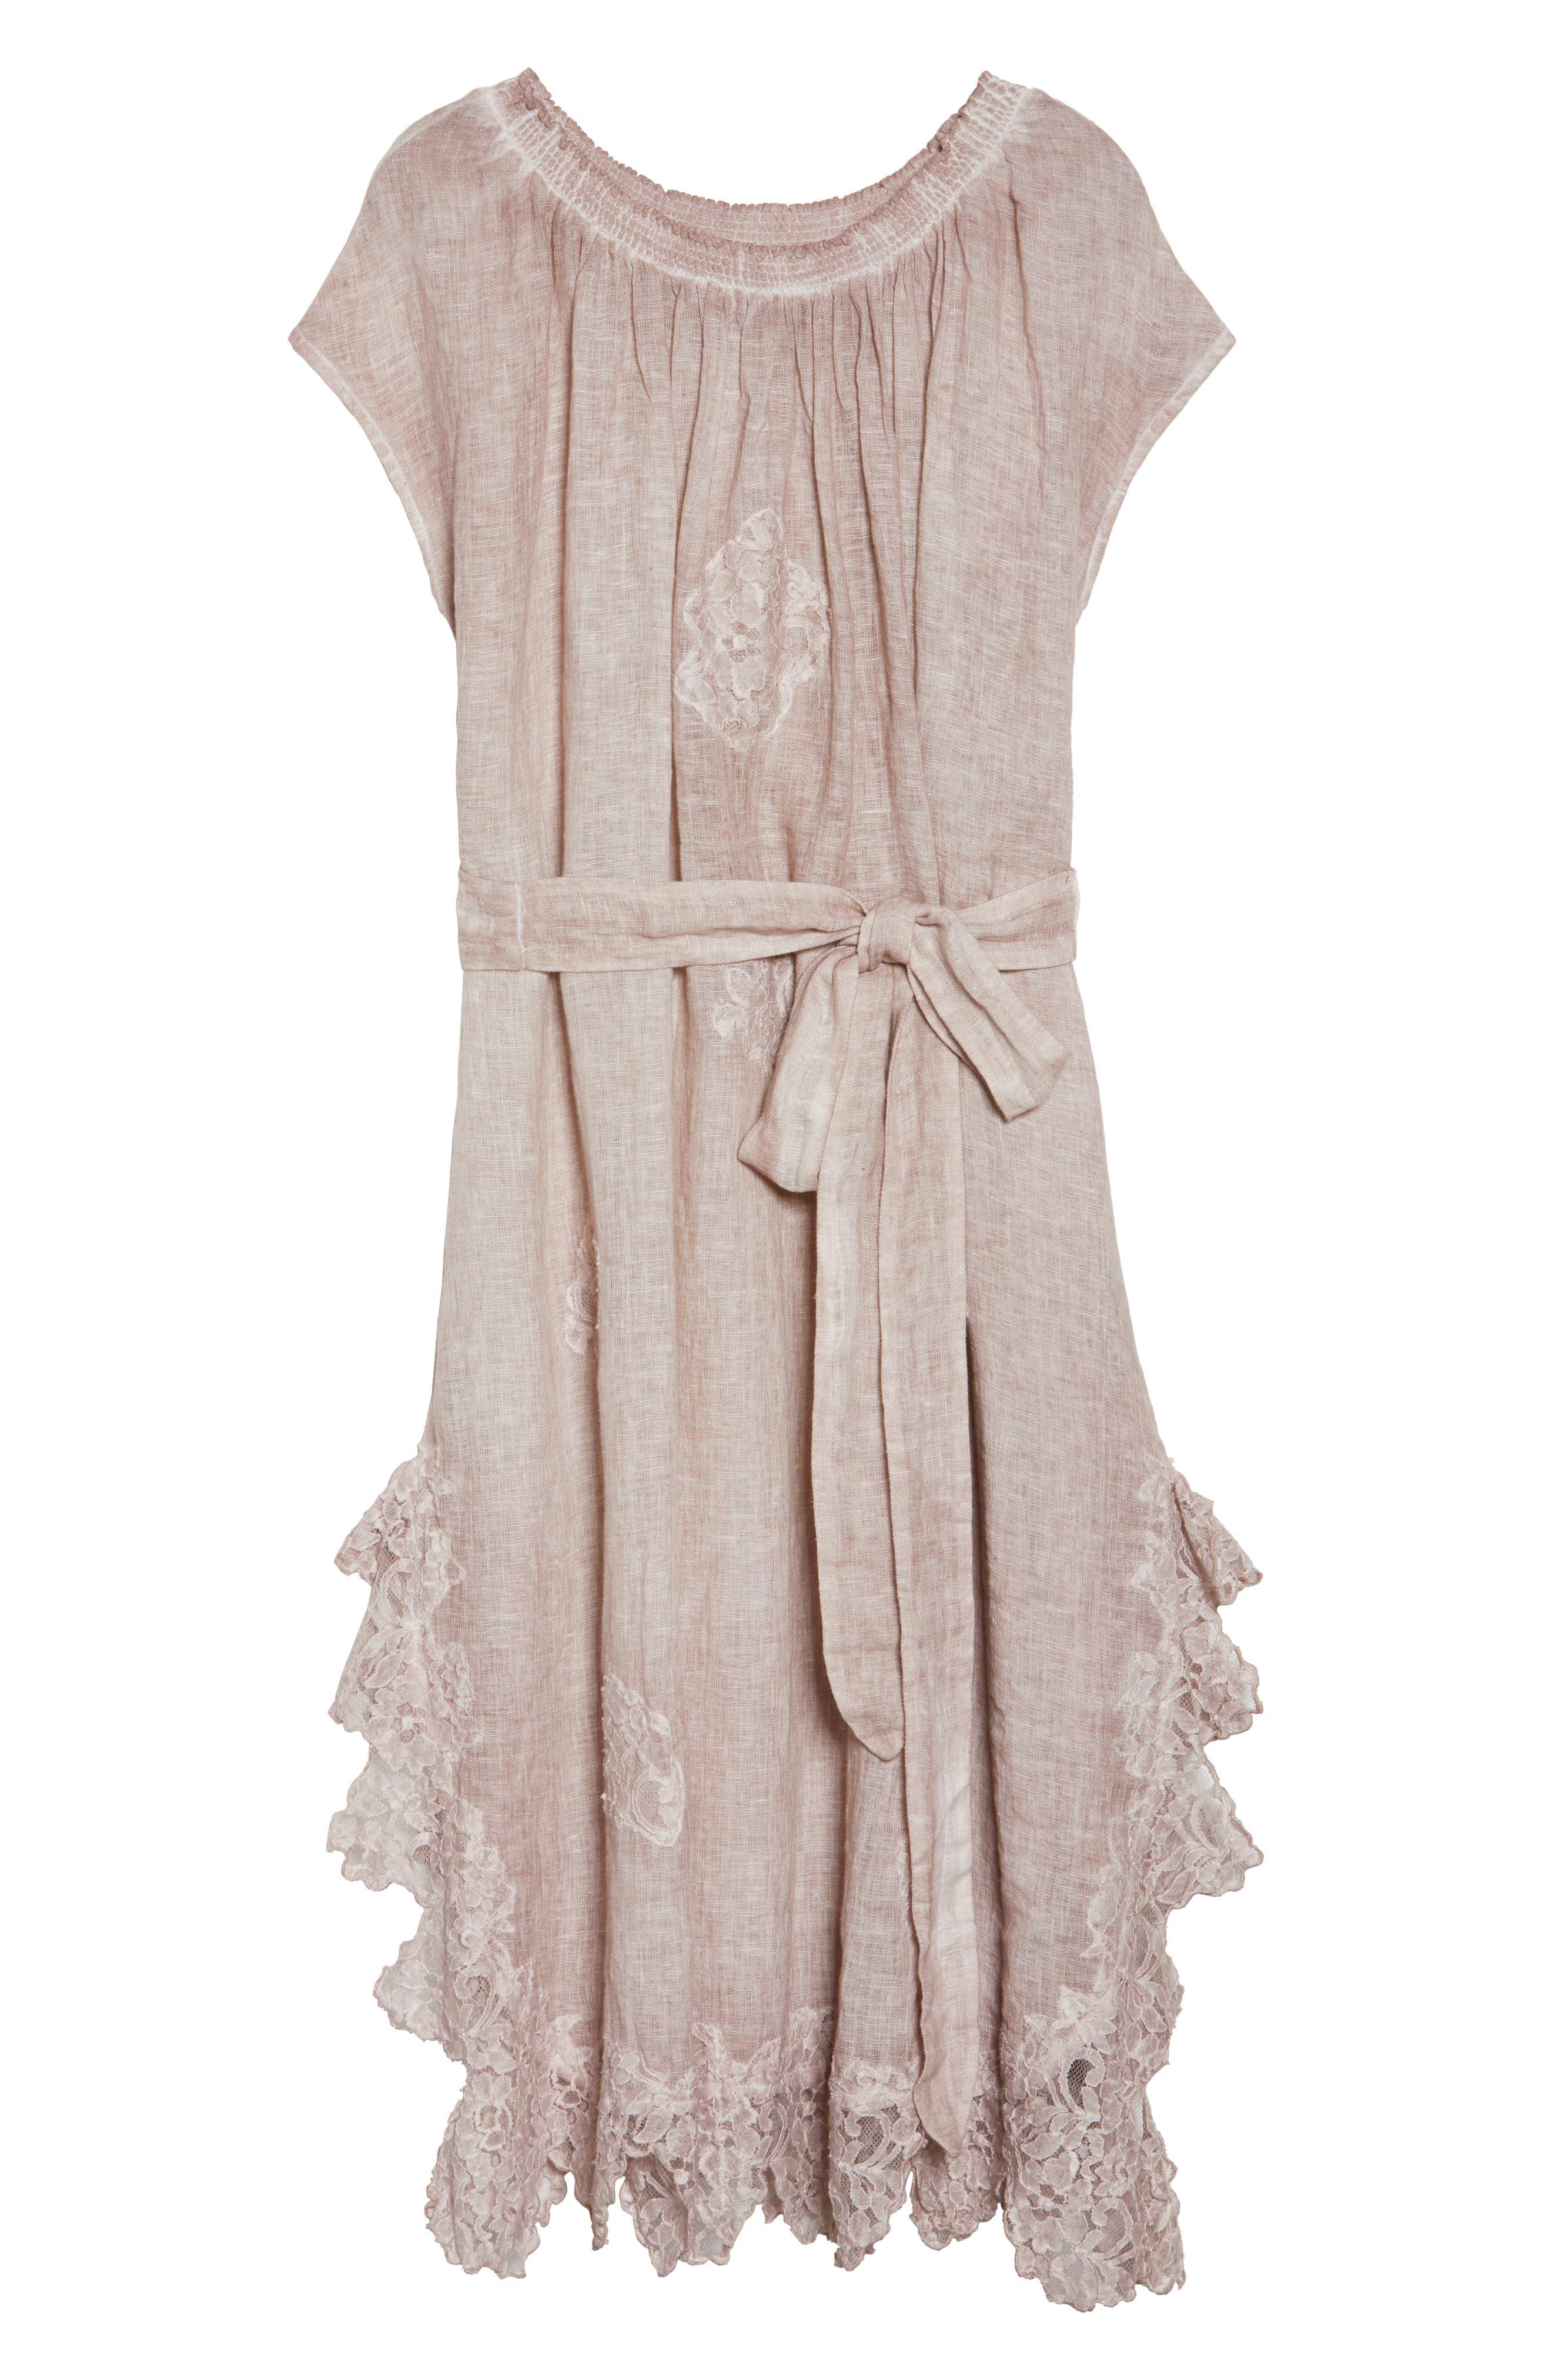 Daisy Linen Cover-Up Dress,                             Alternate thumbnail 6, color,                             652